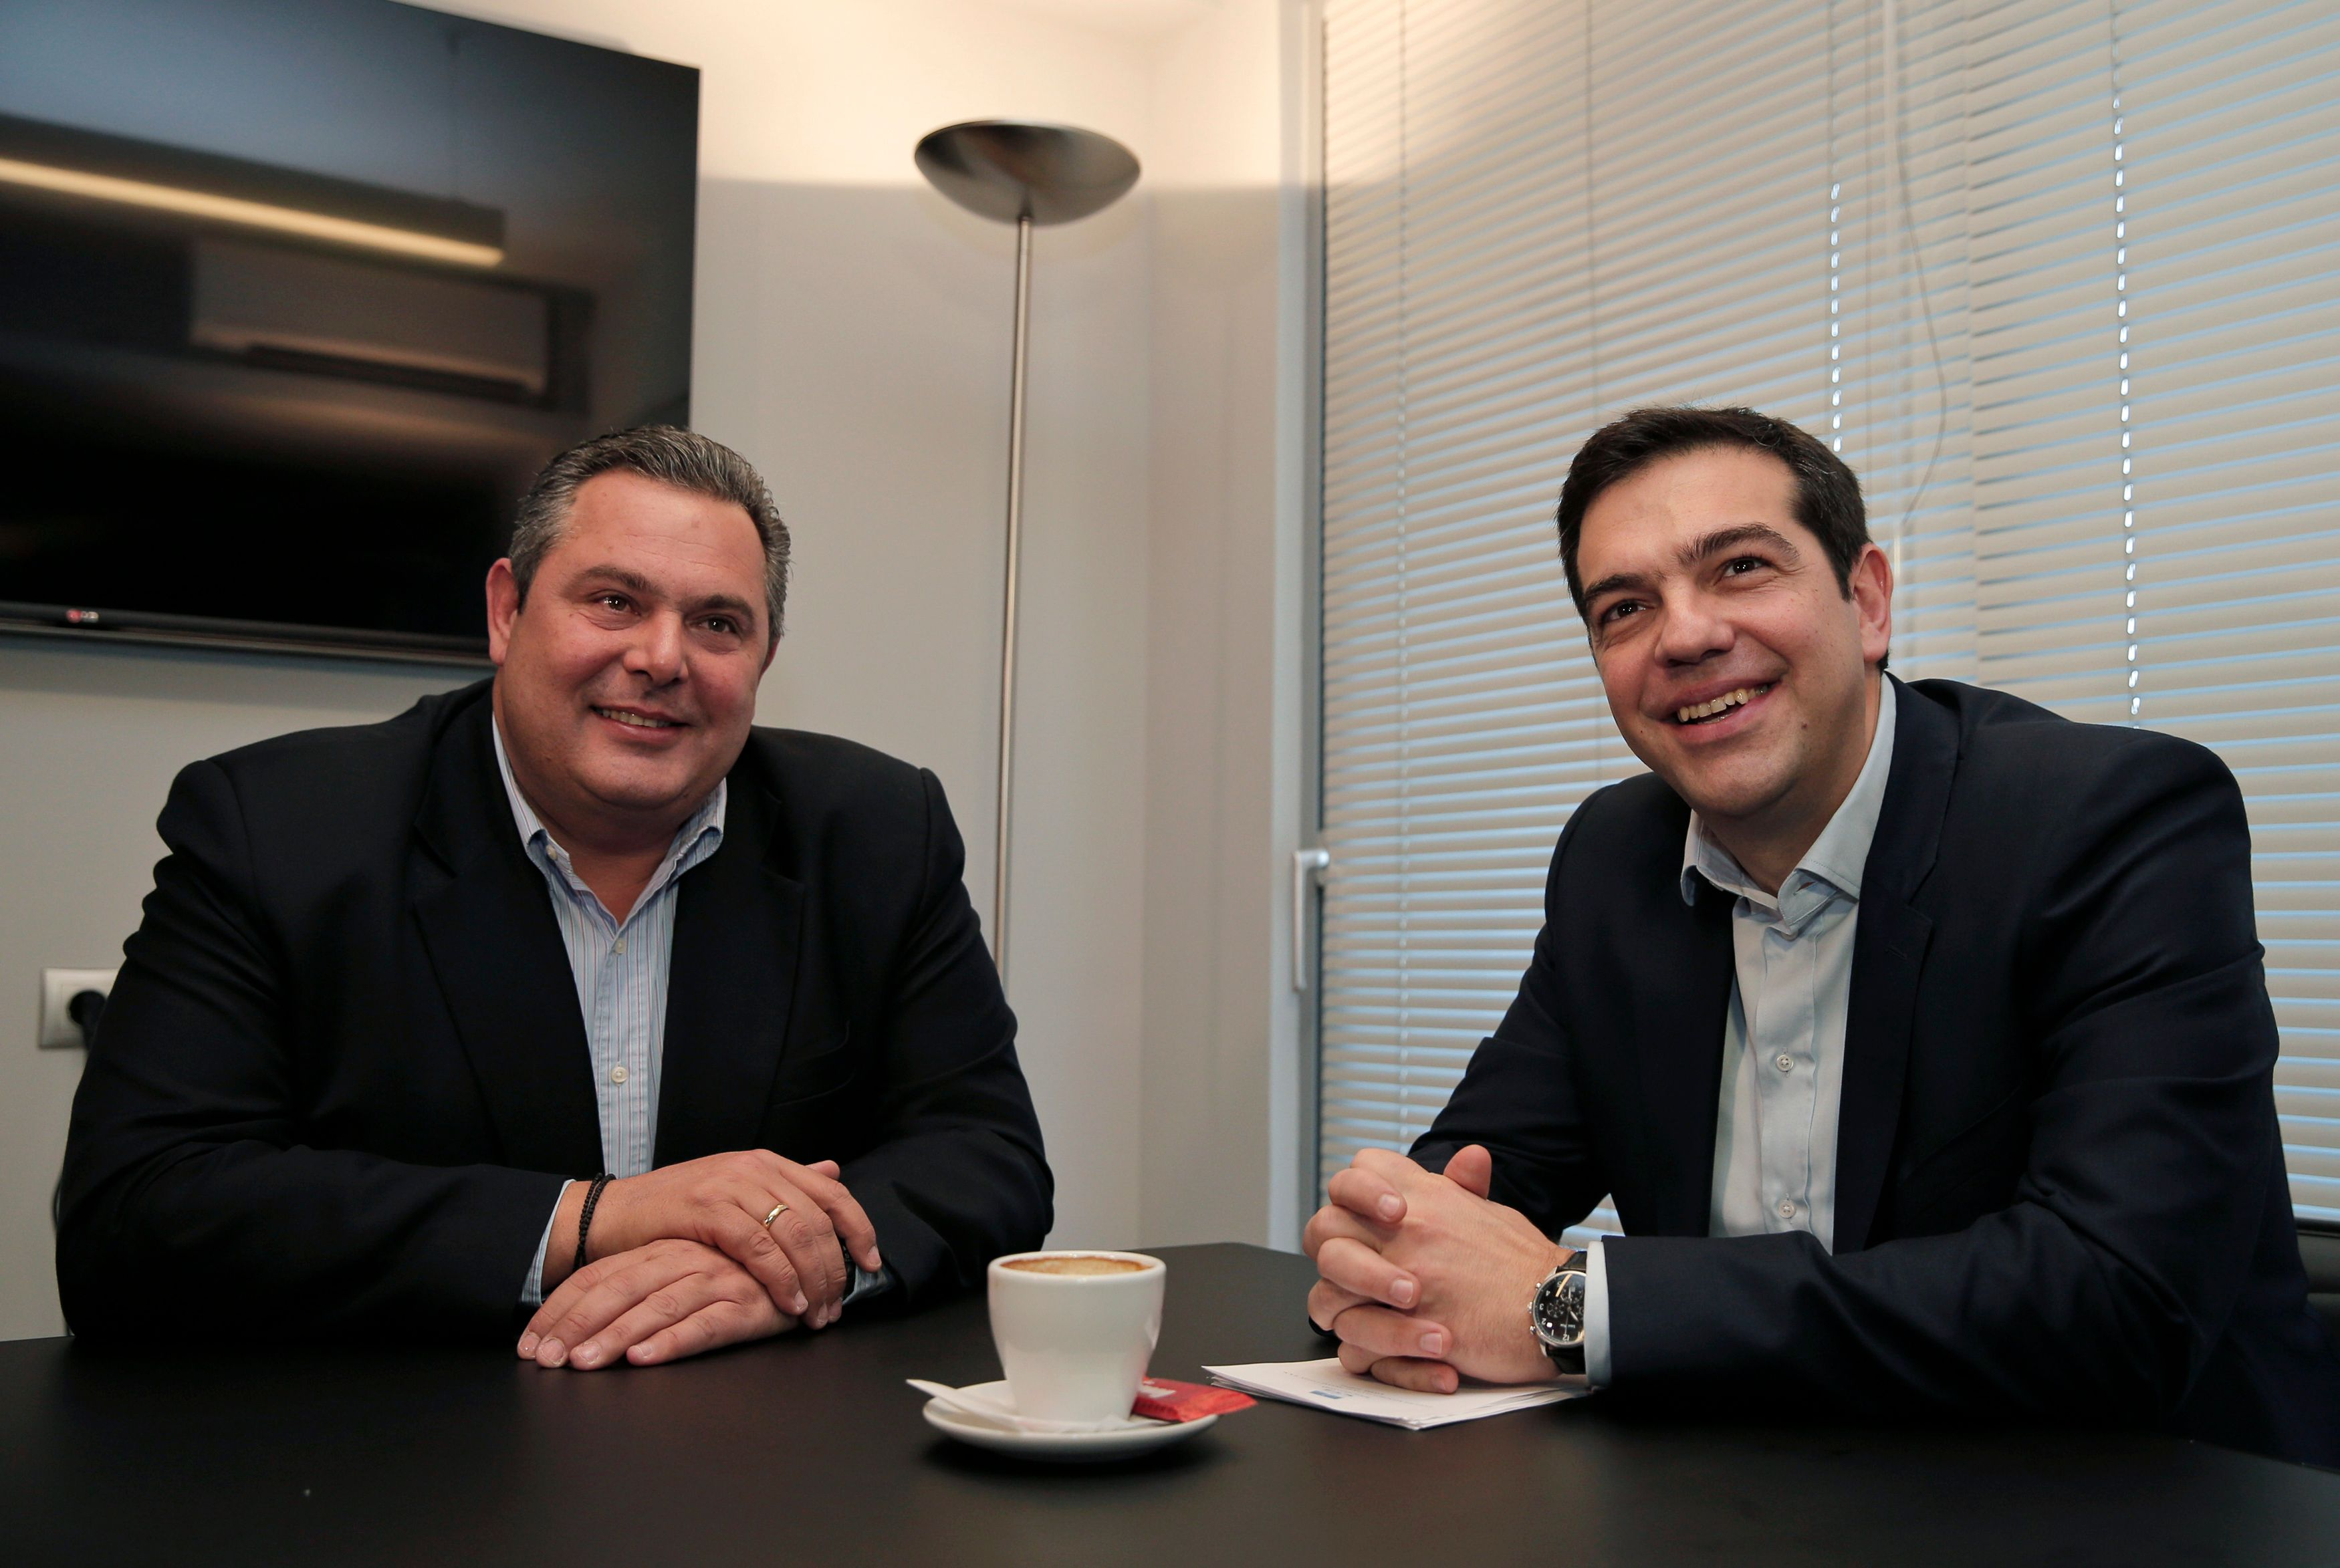 Panos Kammenos et Alexis Tsipras